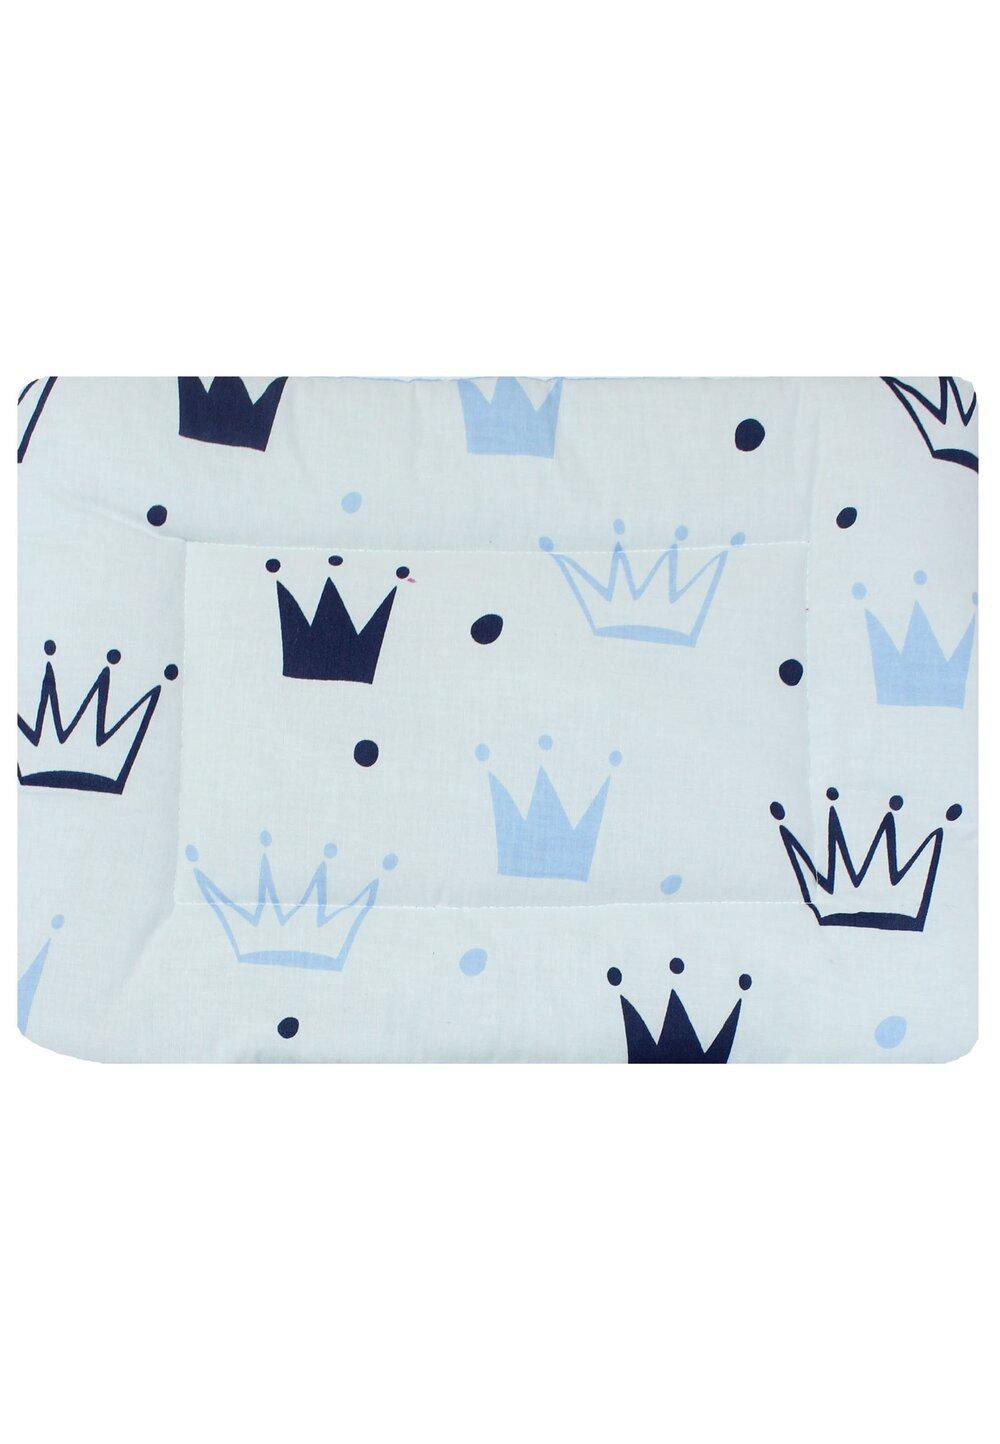 Perna slim, coronite, Prince, alb cu albastru, 37x28cm imagine